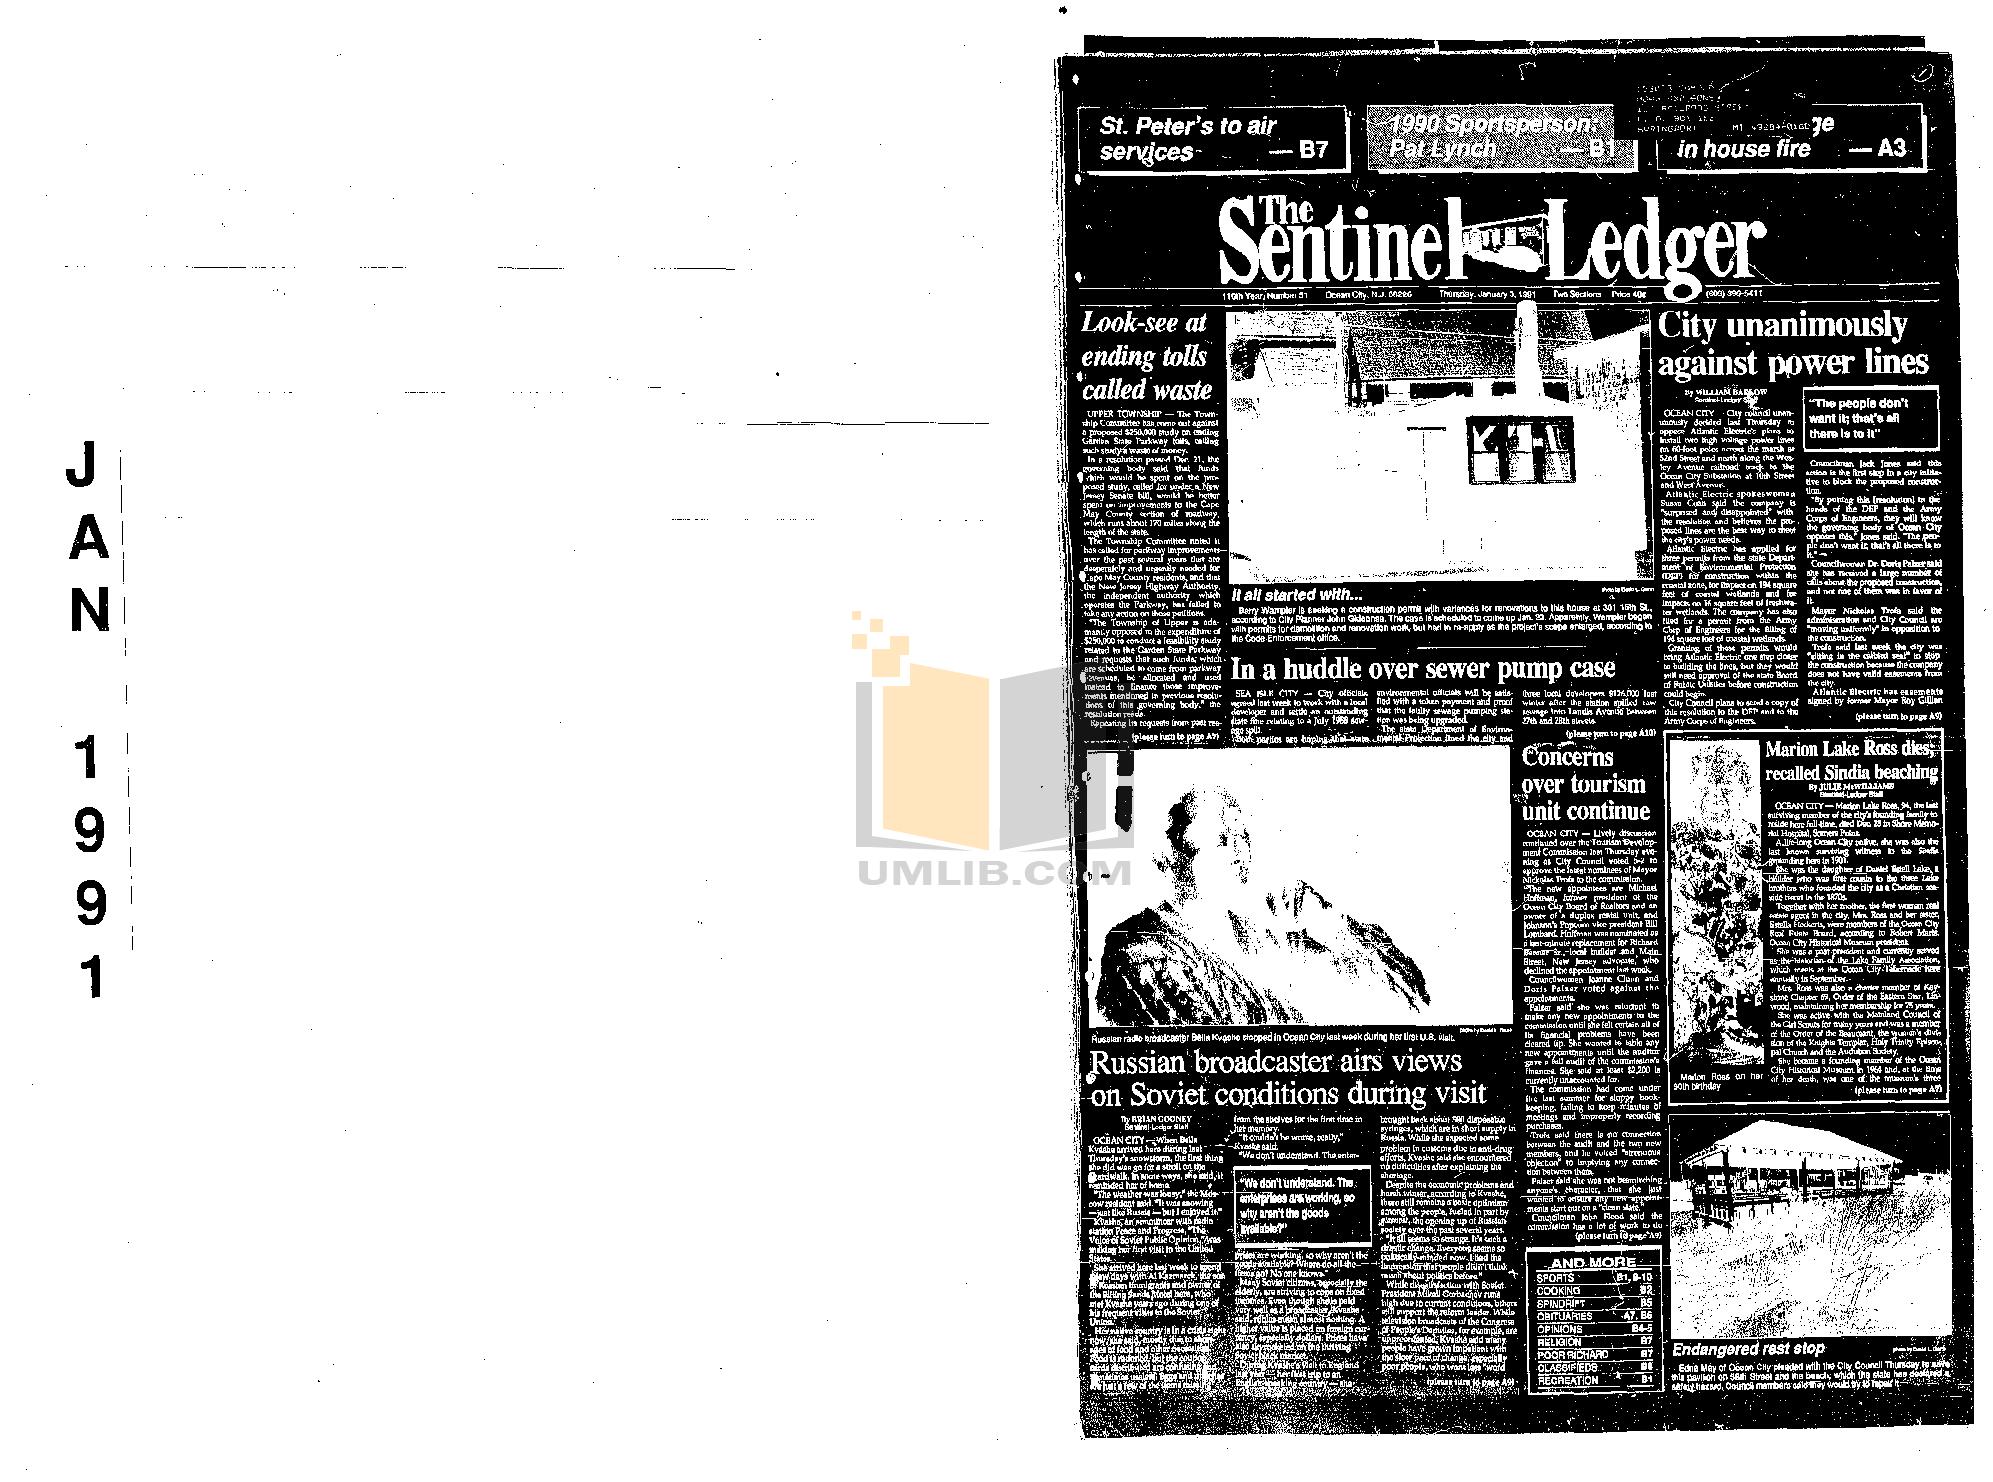 pdf for Franklin PDA QLM-2200 manual